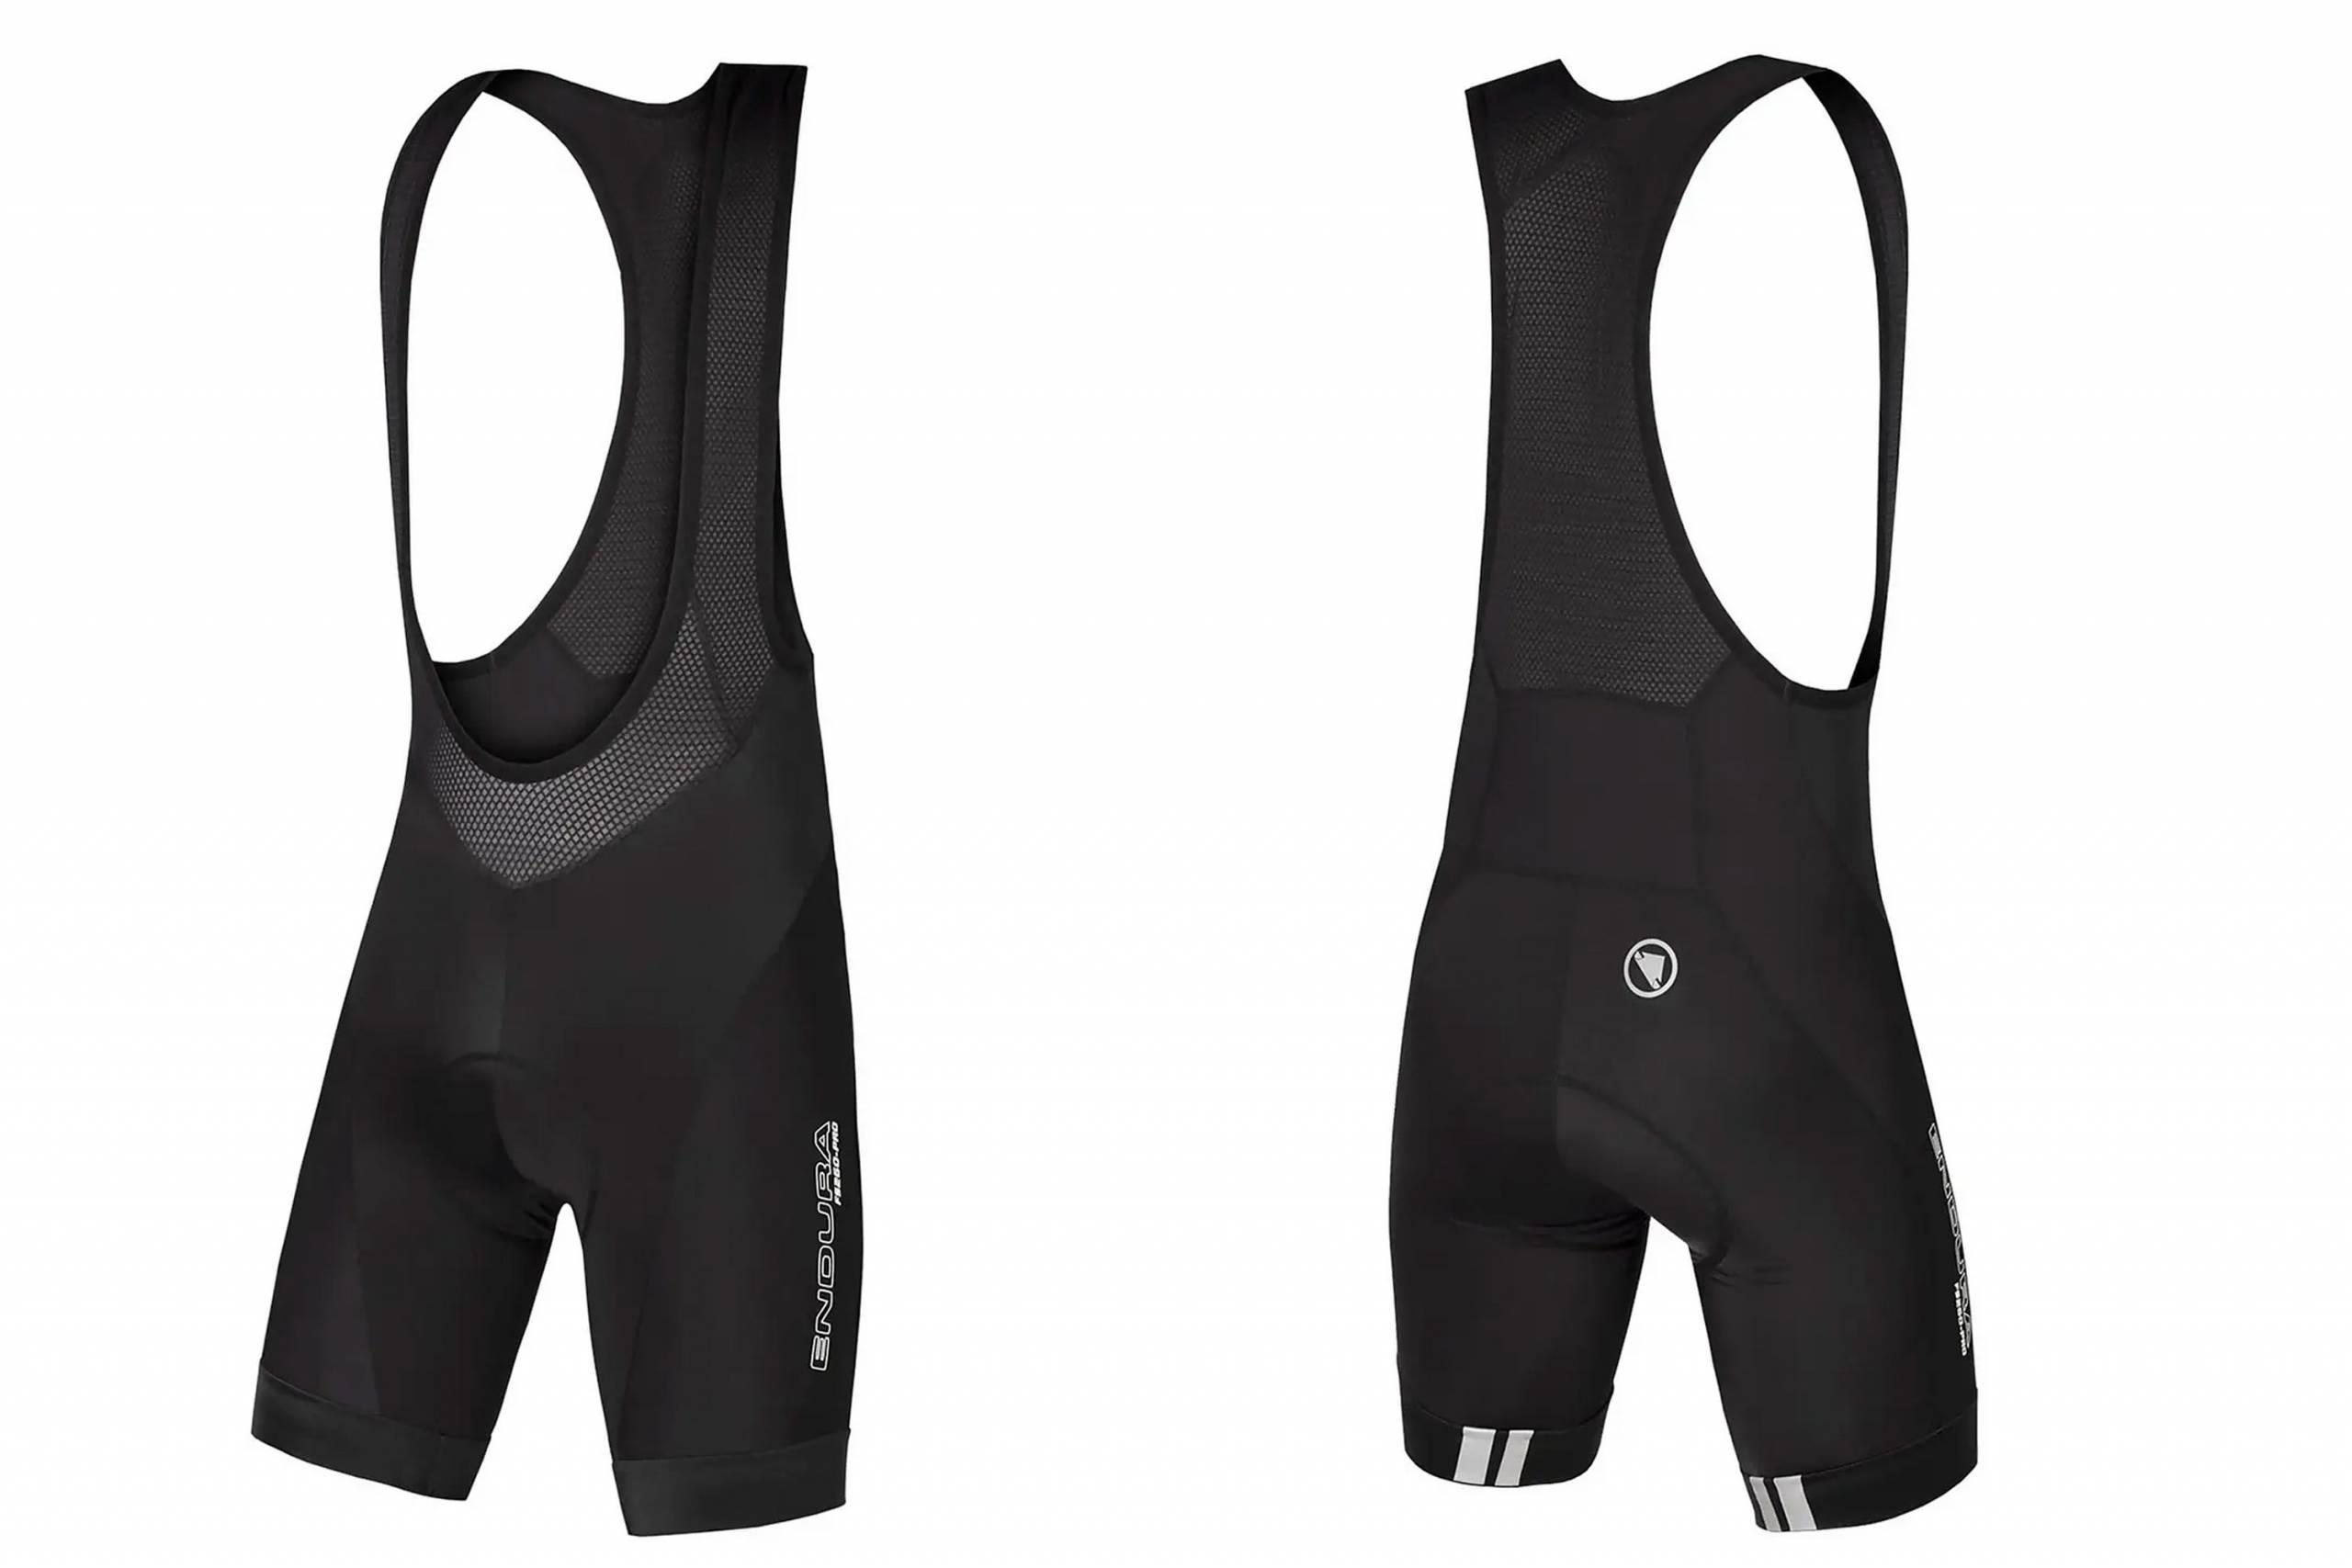 GearJunkie_Best_Bib_shorts_2021_Endura_FS260_Pro